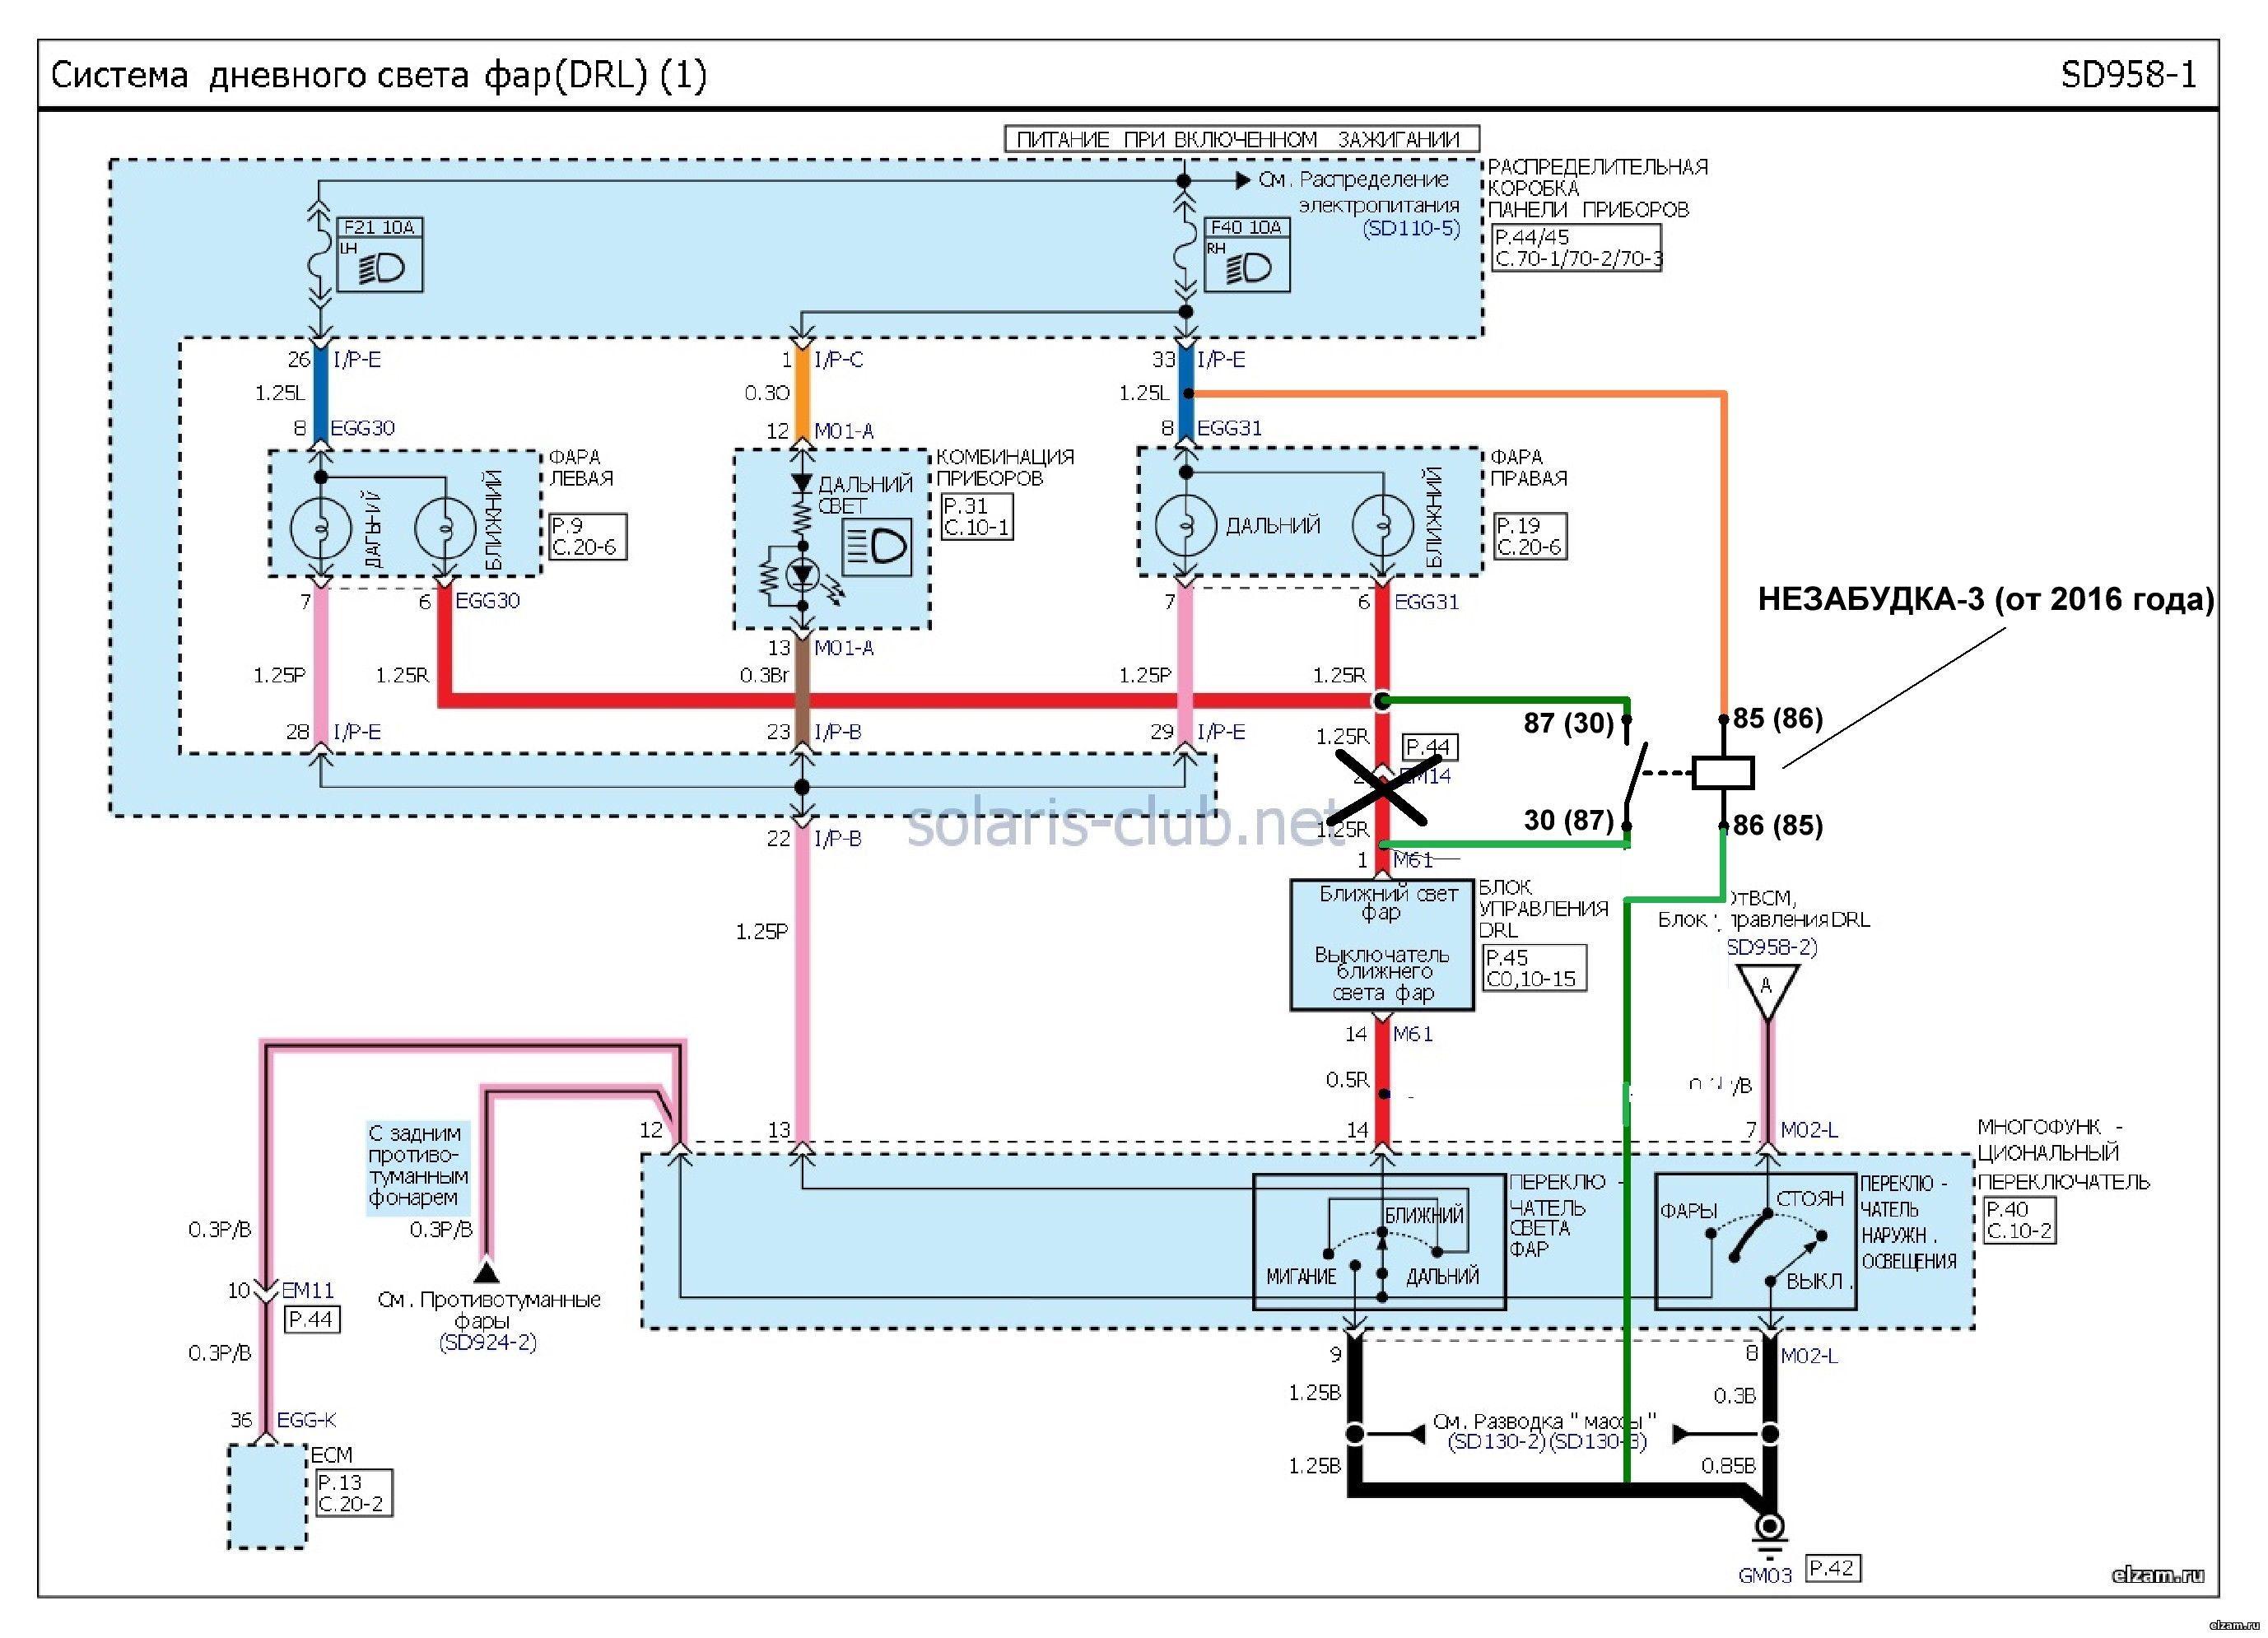 Тускнеют фары на Hyundai Sonata NF при включении обогрева заднего стекла